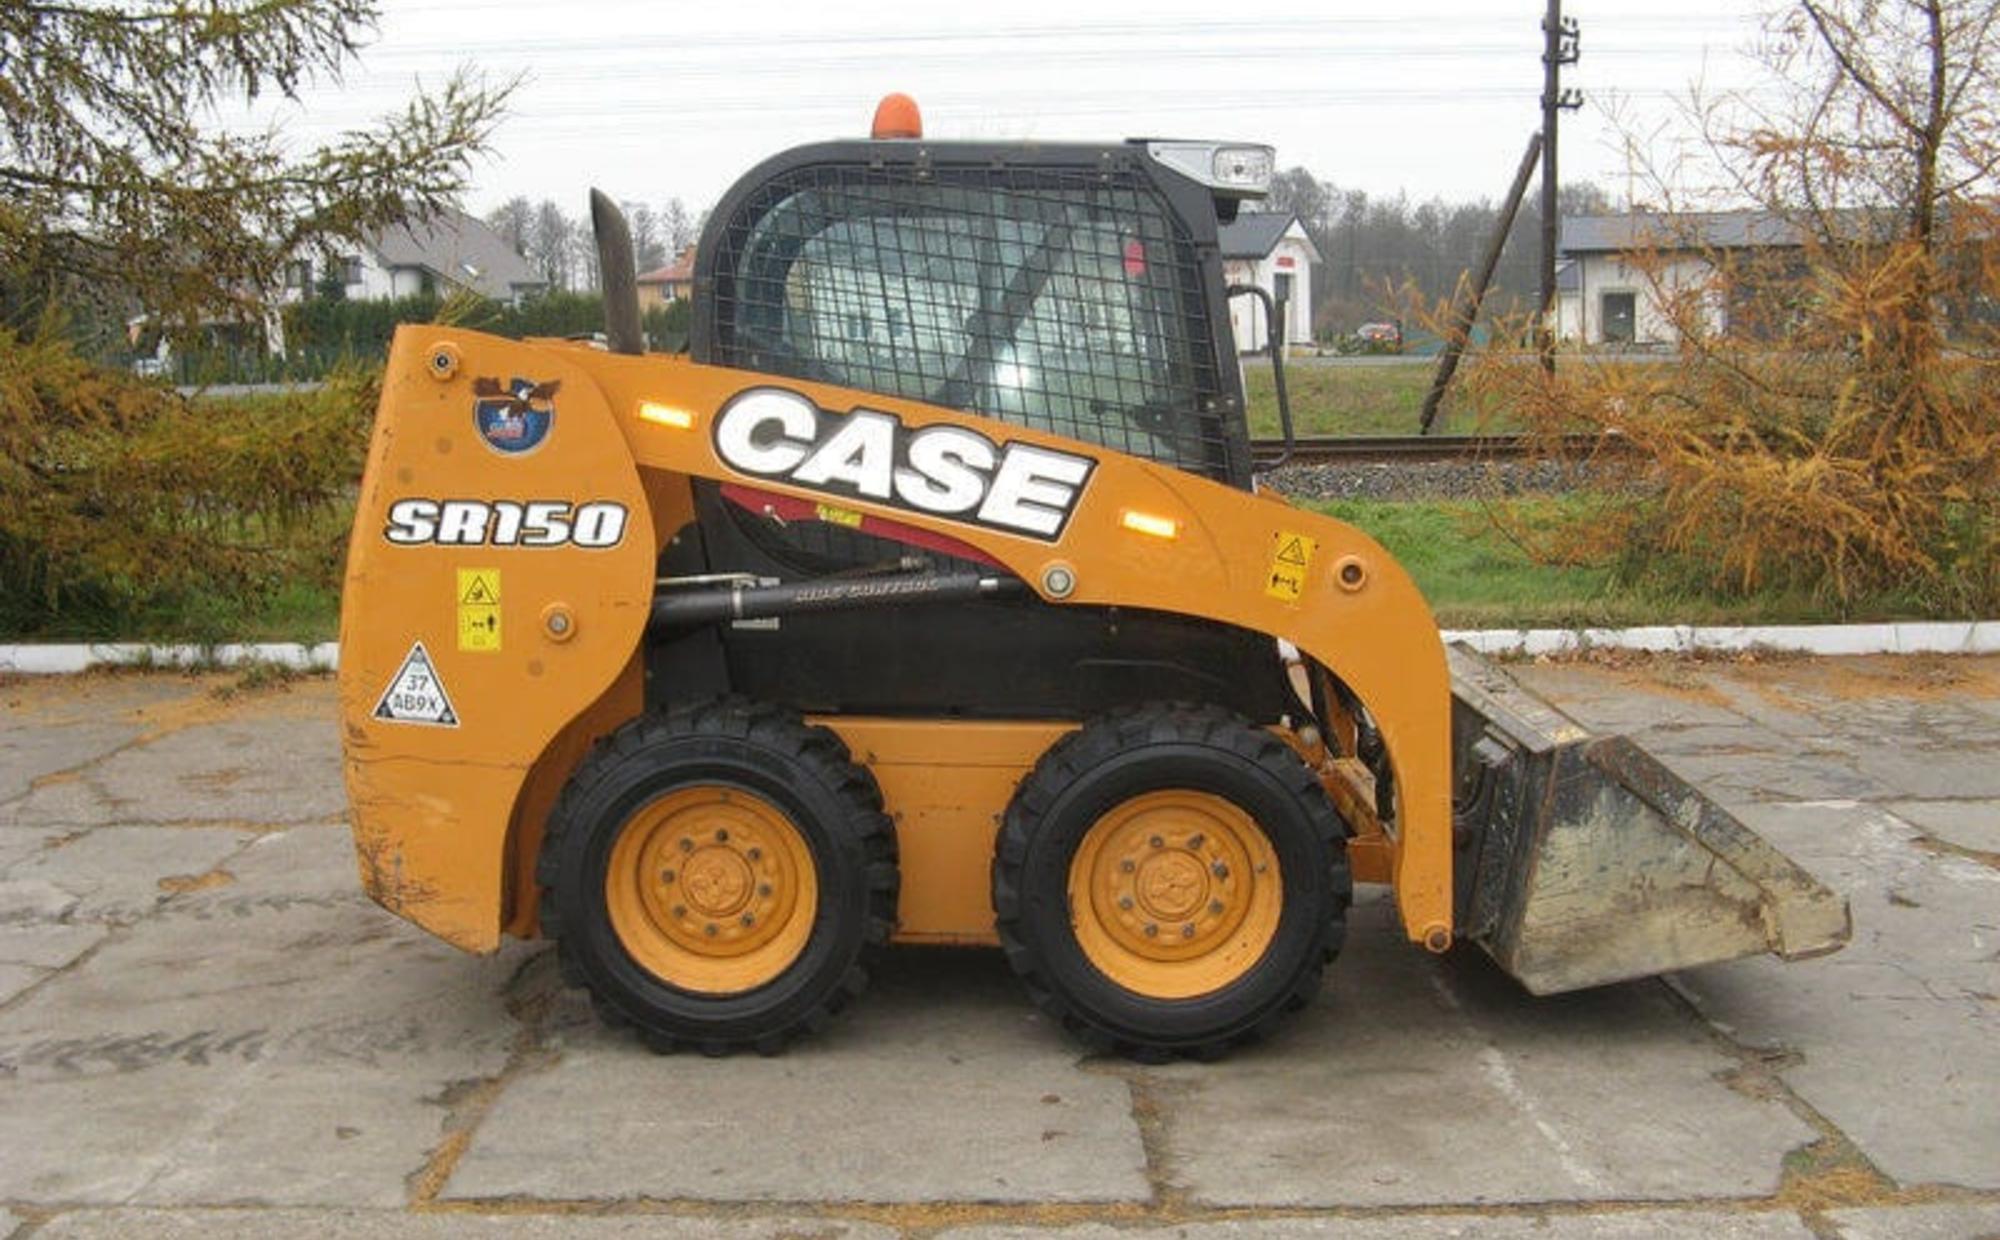 Аренда мини погрузчика Case SR150